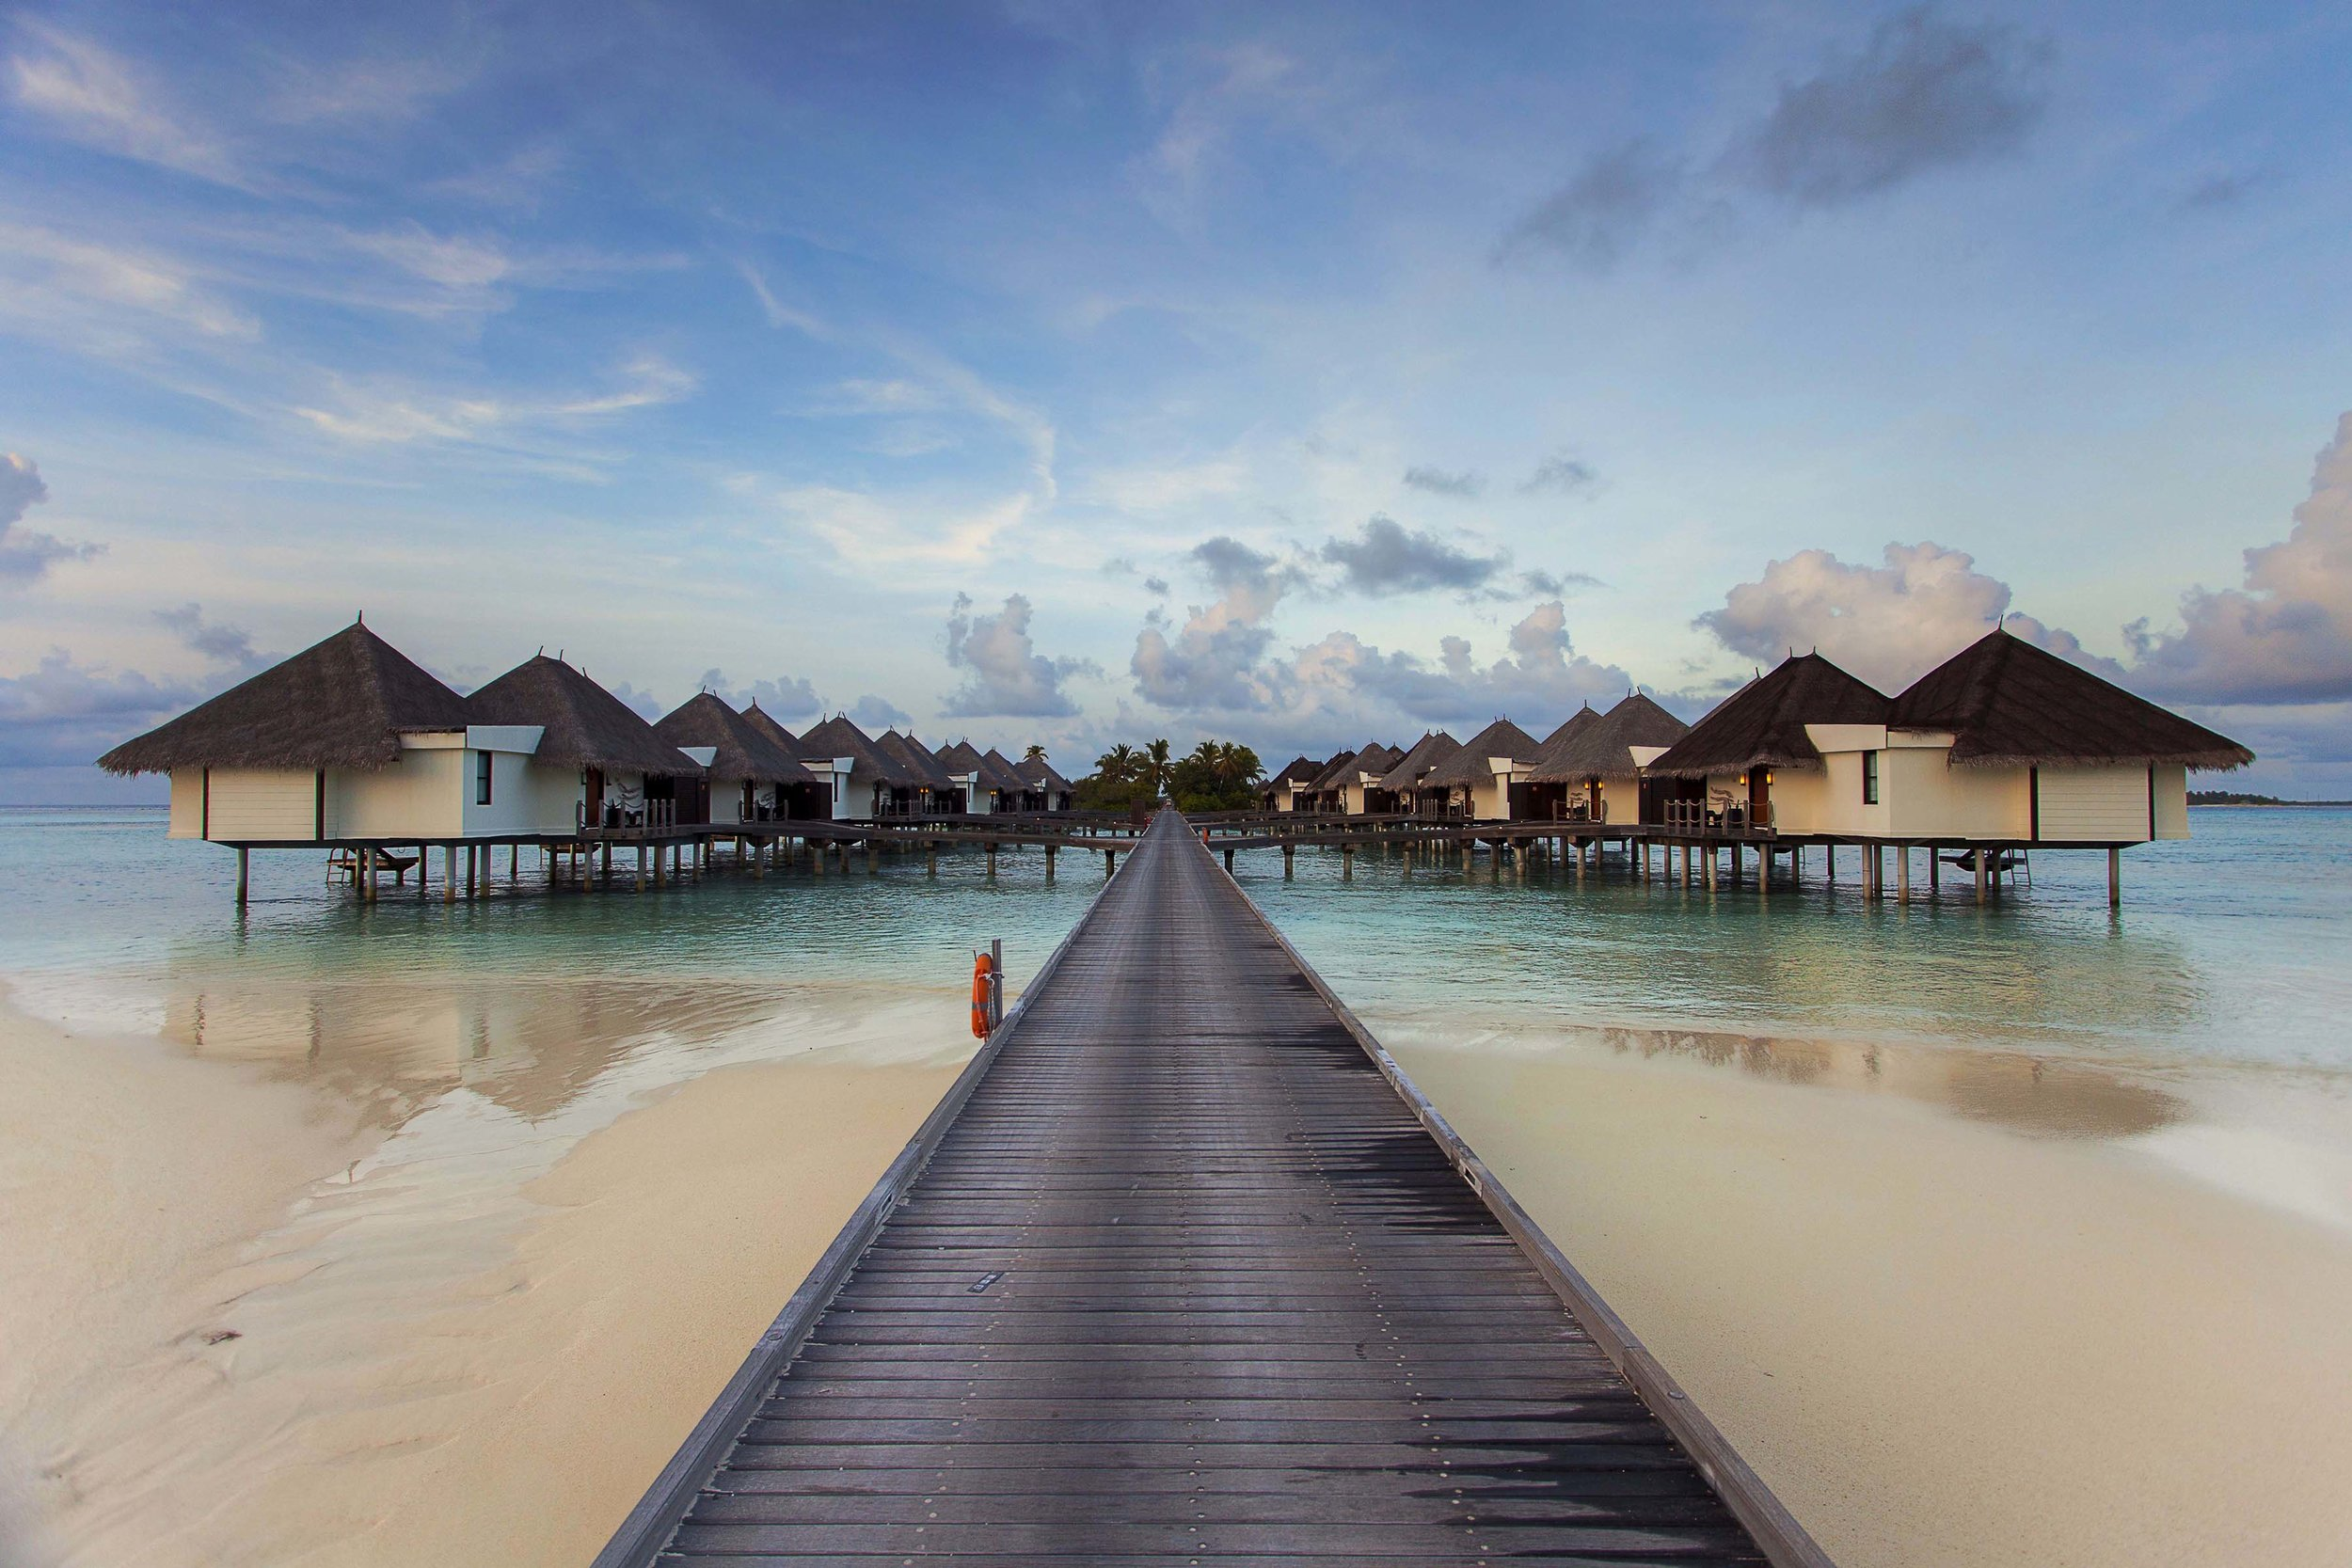 Maldives_Apr182010_1768 (2) Raw edit copy.jpg